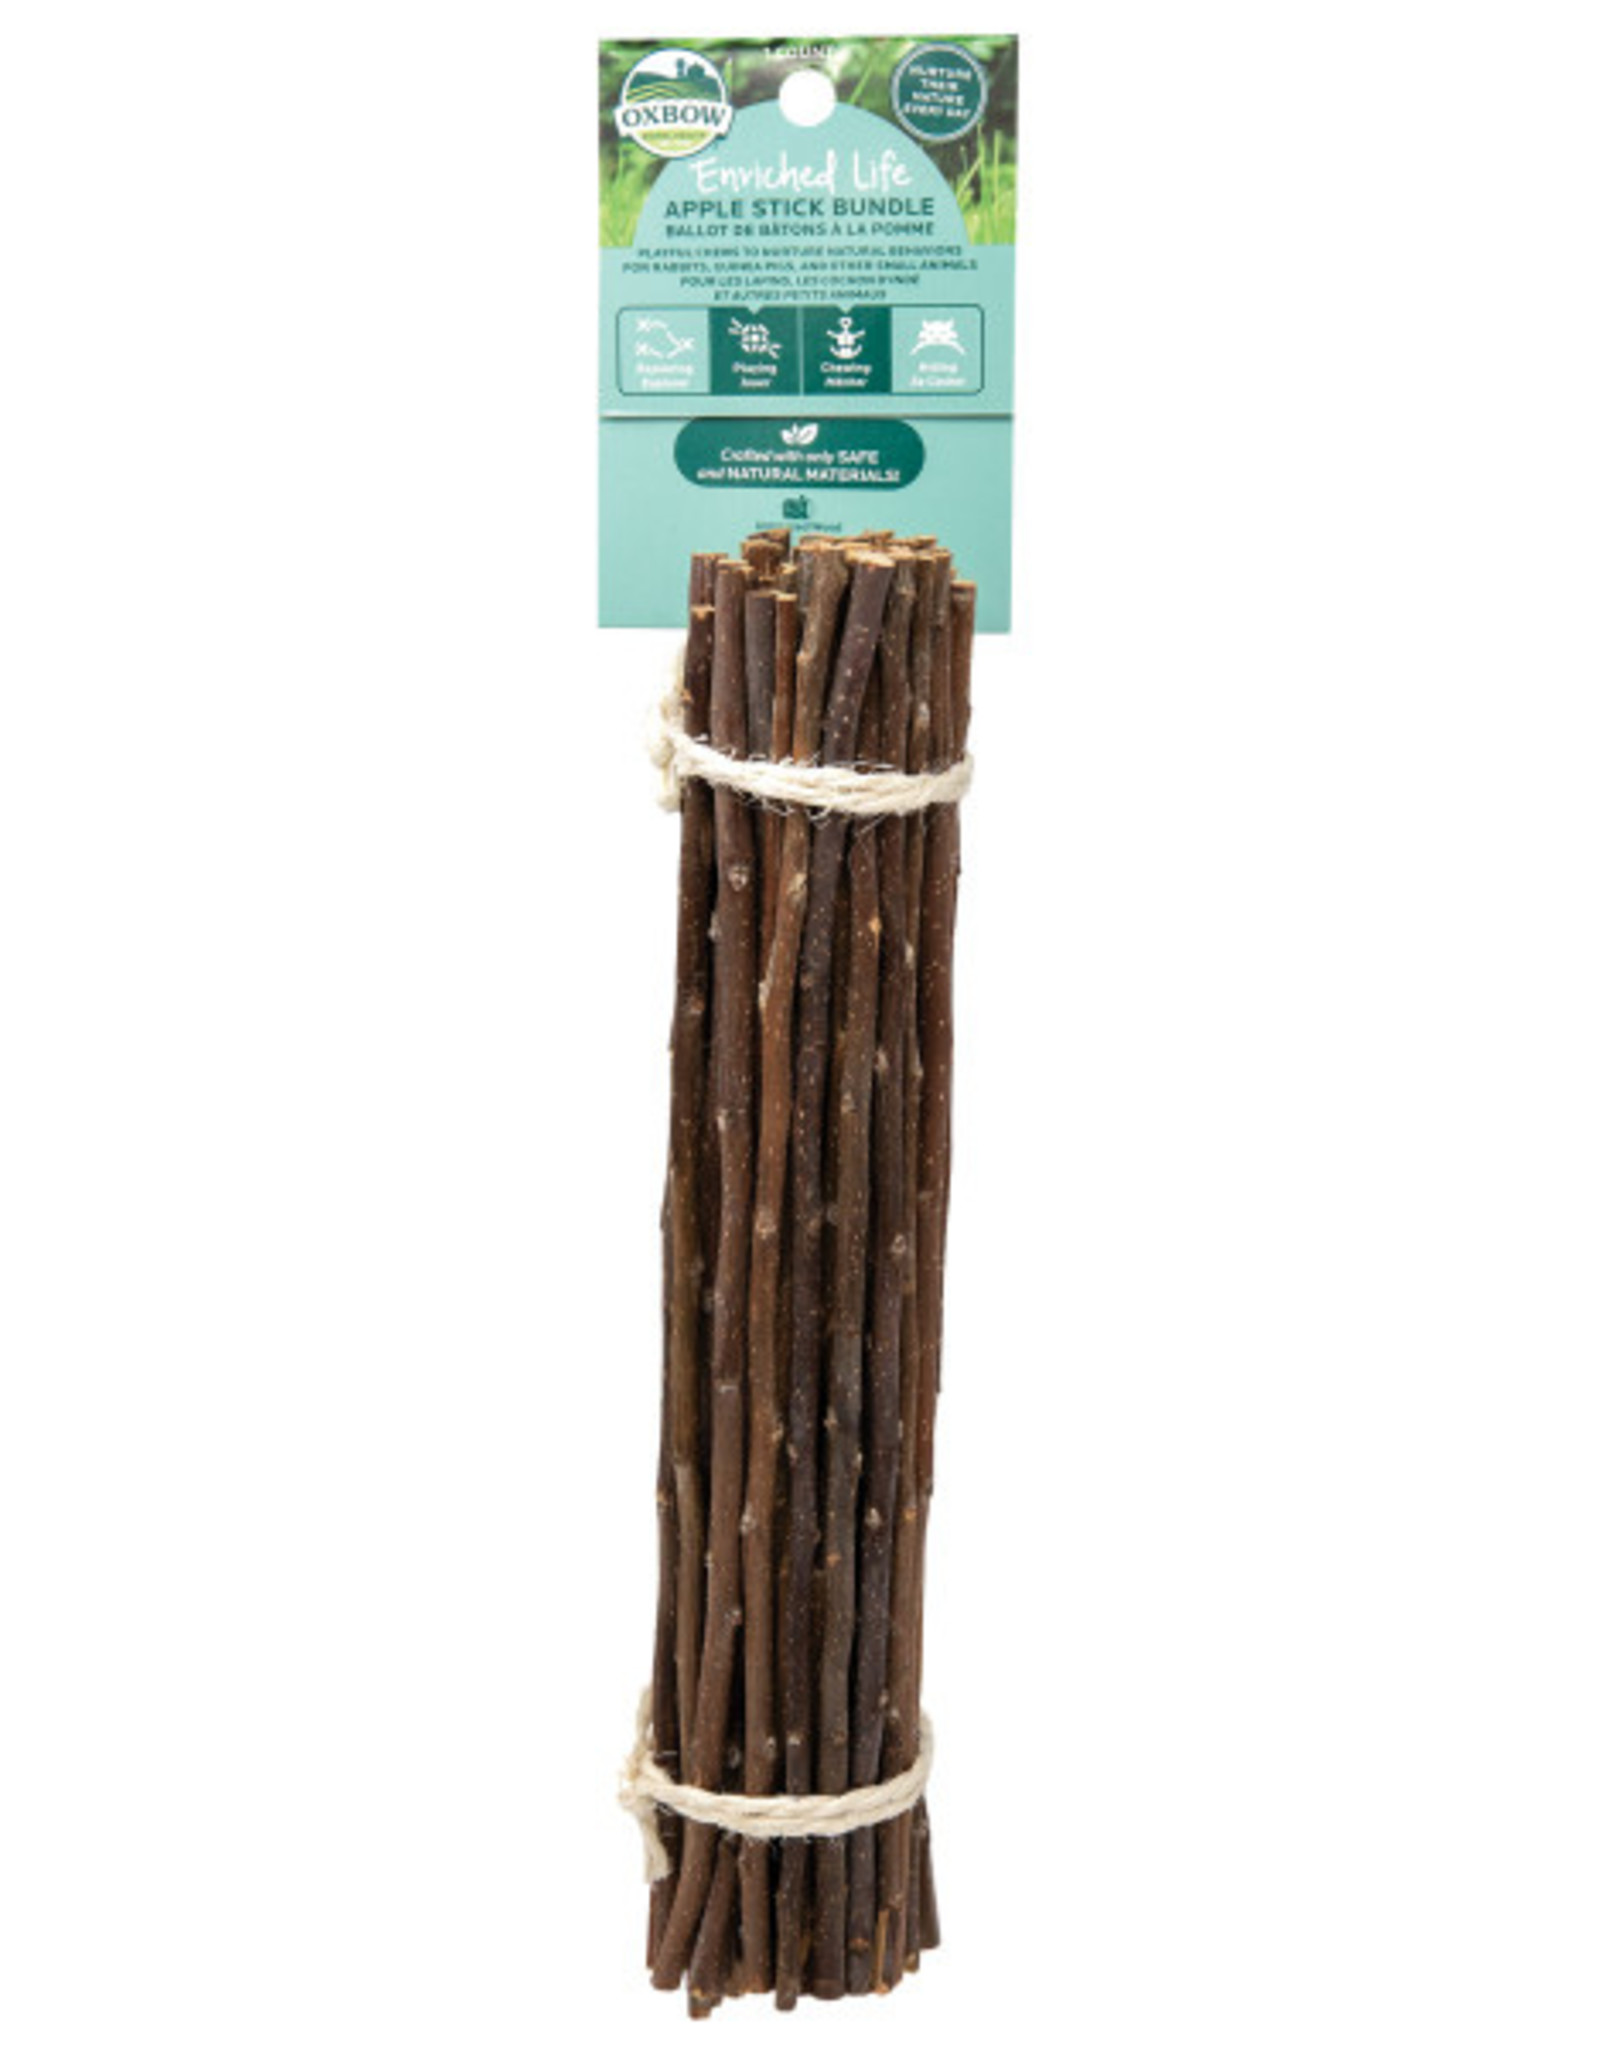 Oxbow Apple Stick Bundle